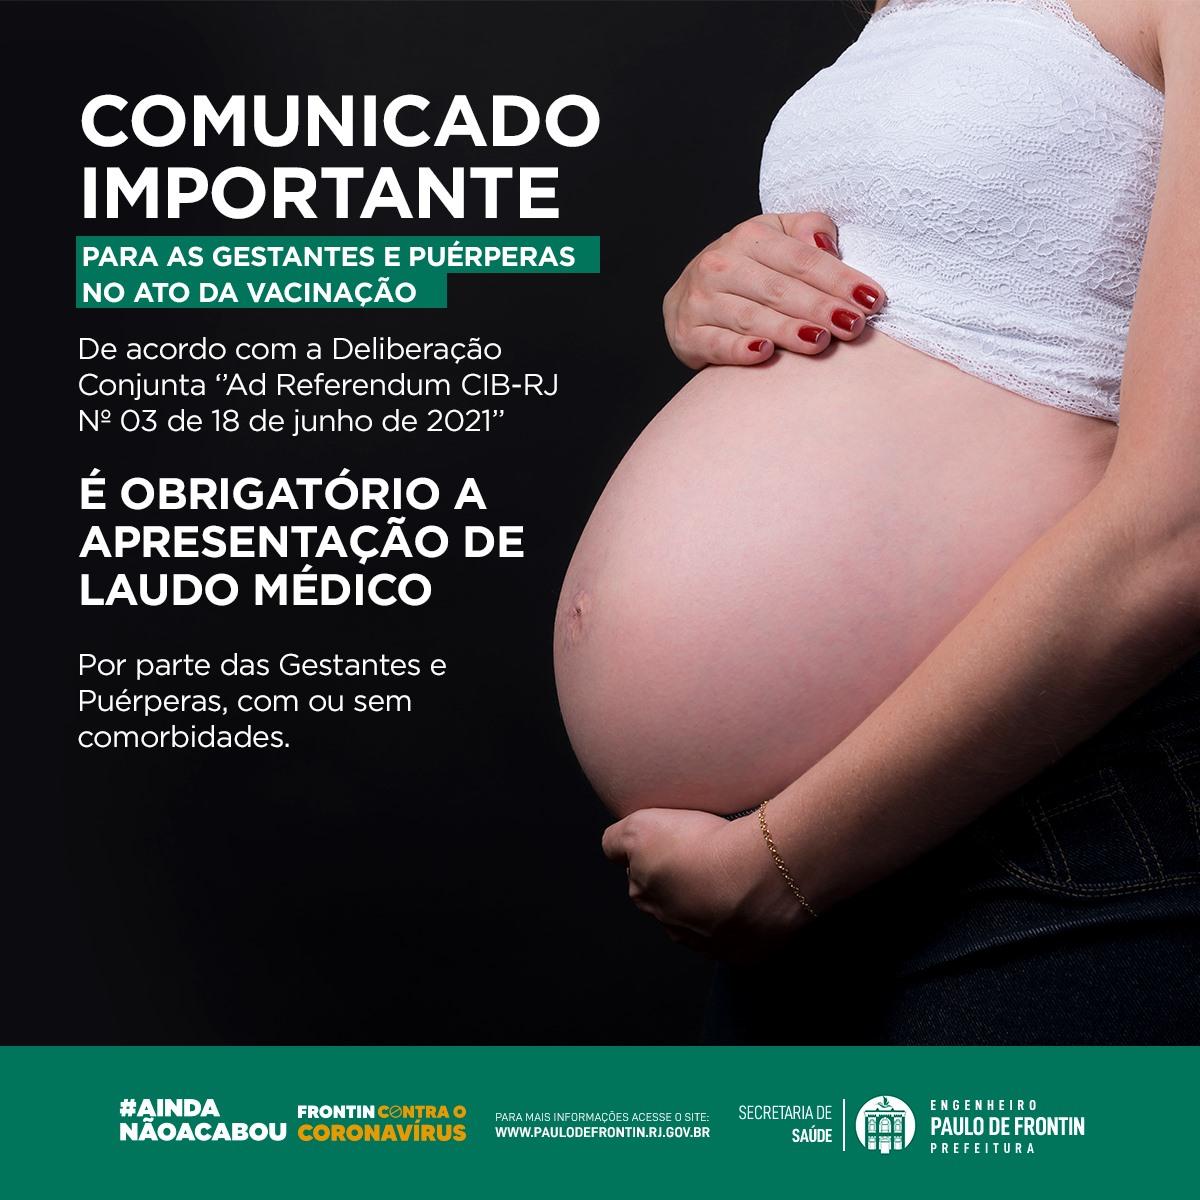 You are currently viewing Comunicado importante para as gestantes e puérperas